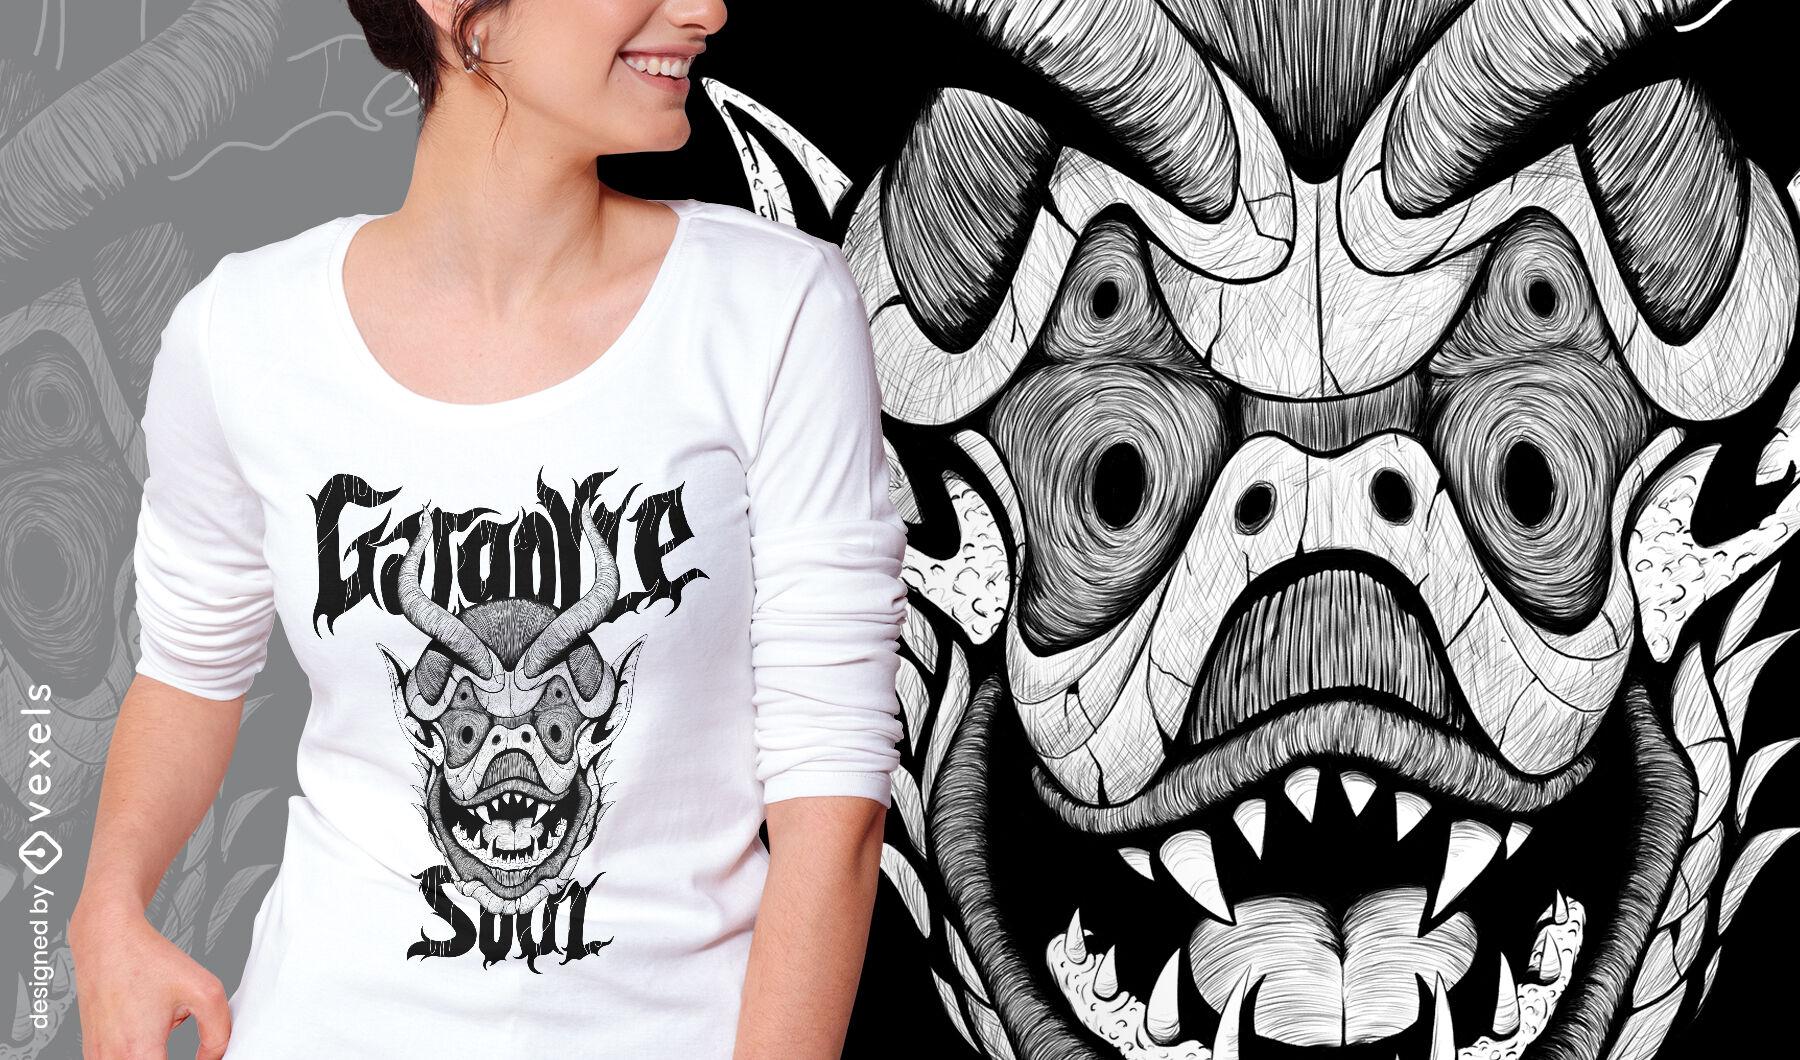 Camiseta dibujada a mano monstruo g?rgola psd